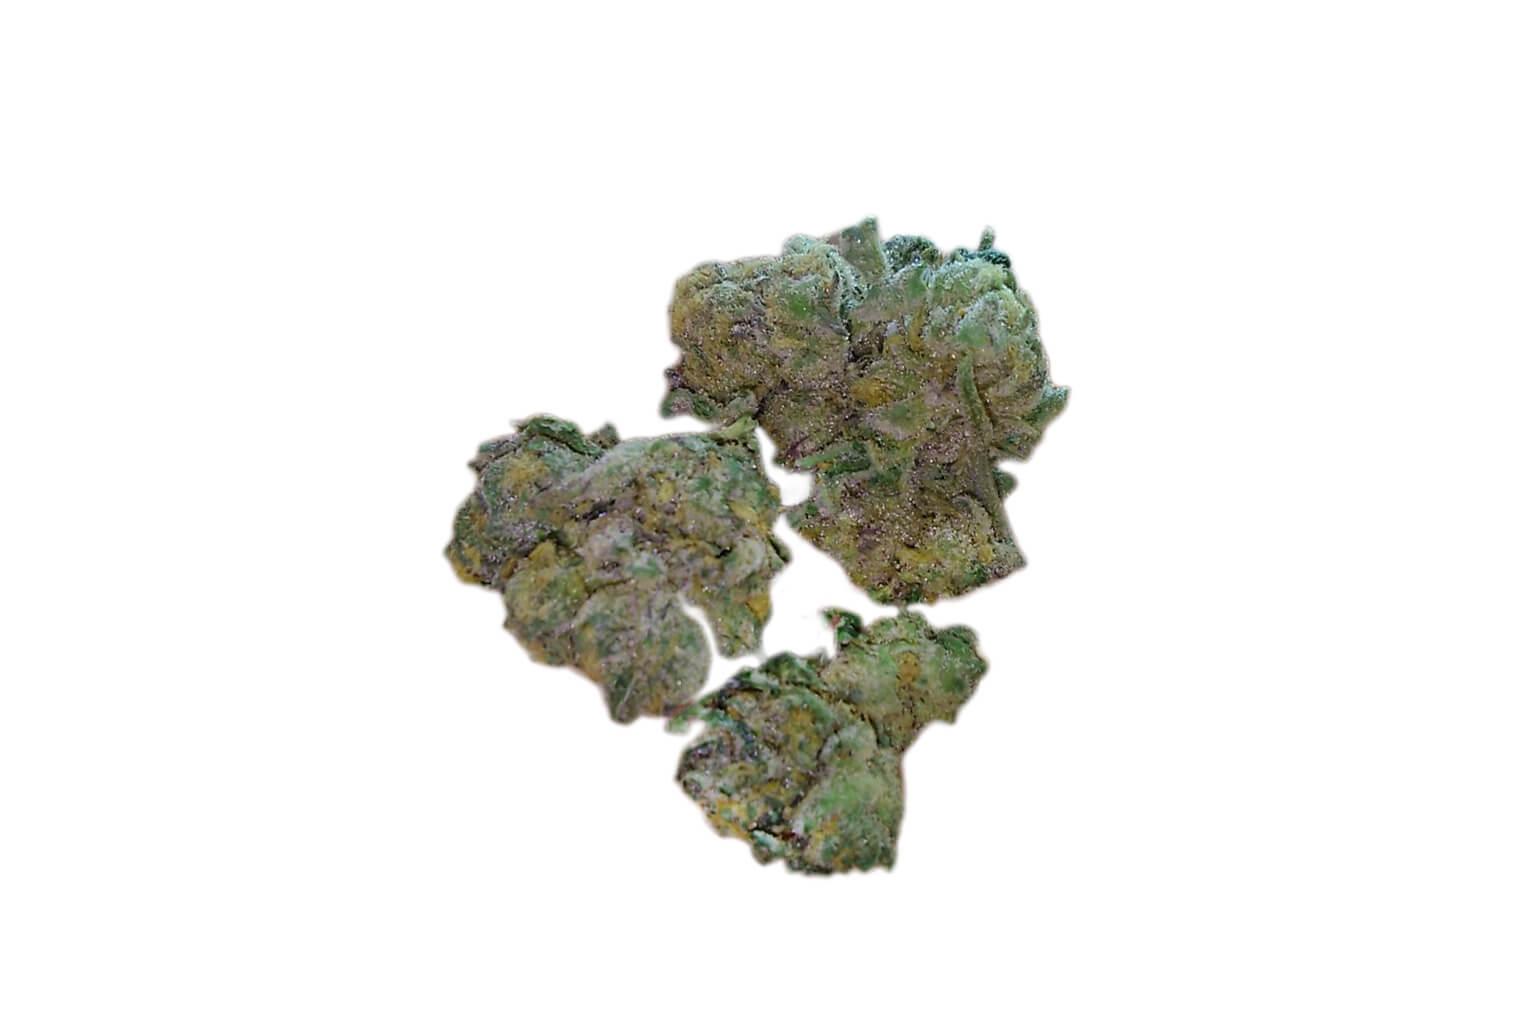 Blue Cookies (Blue GSC) strain photo 2